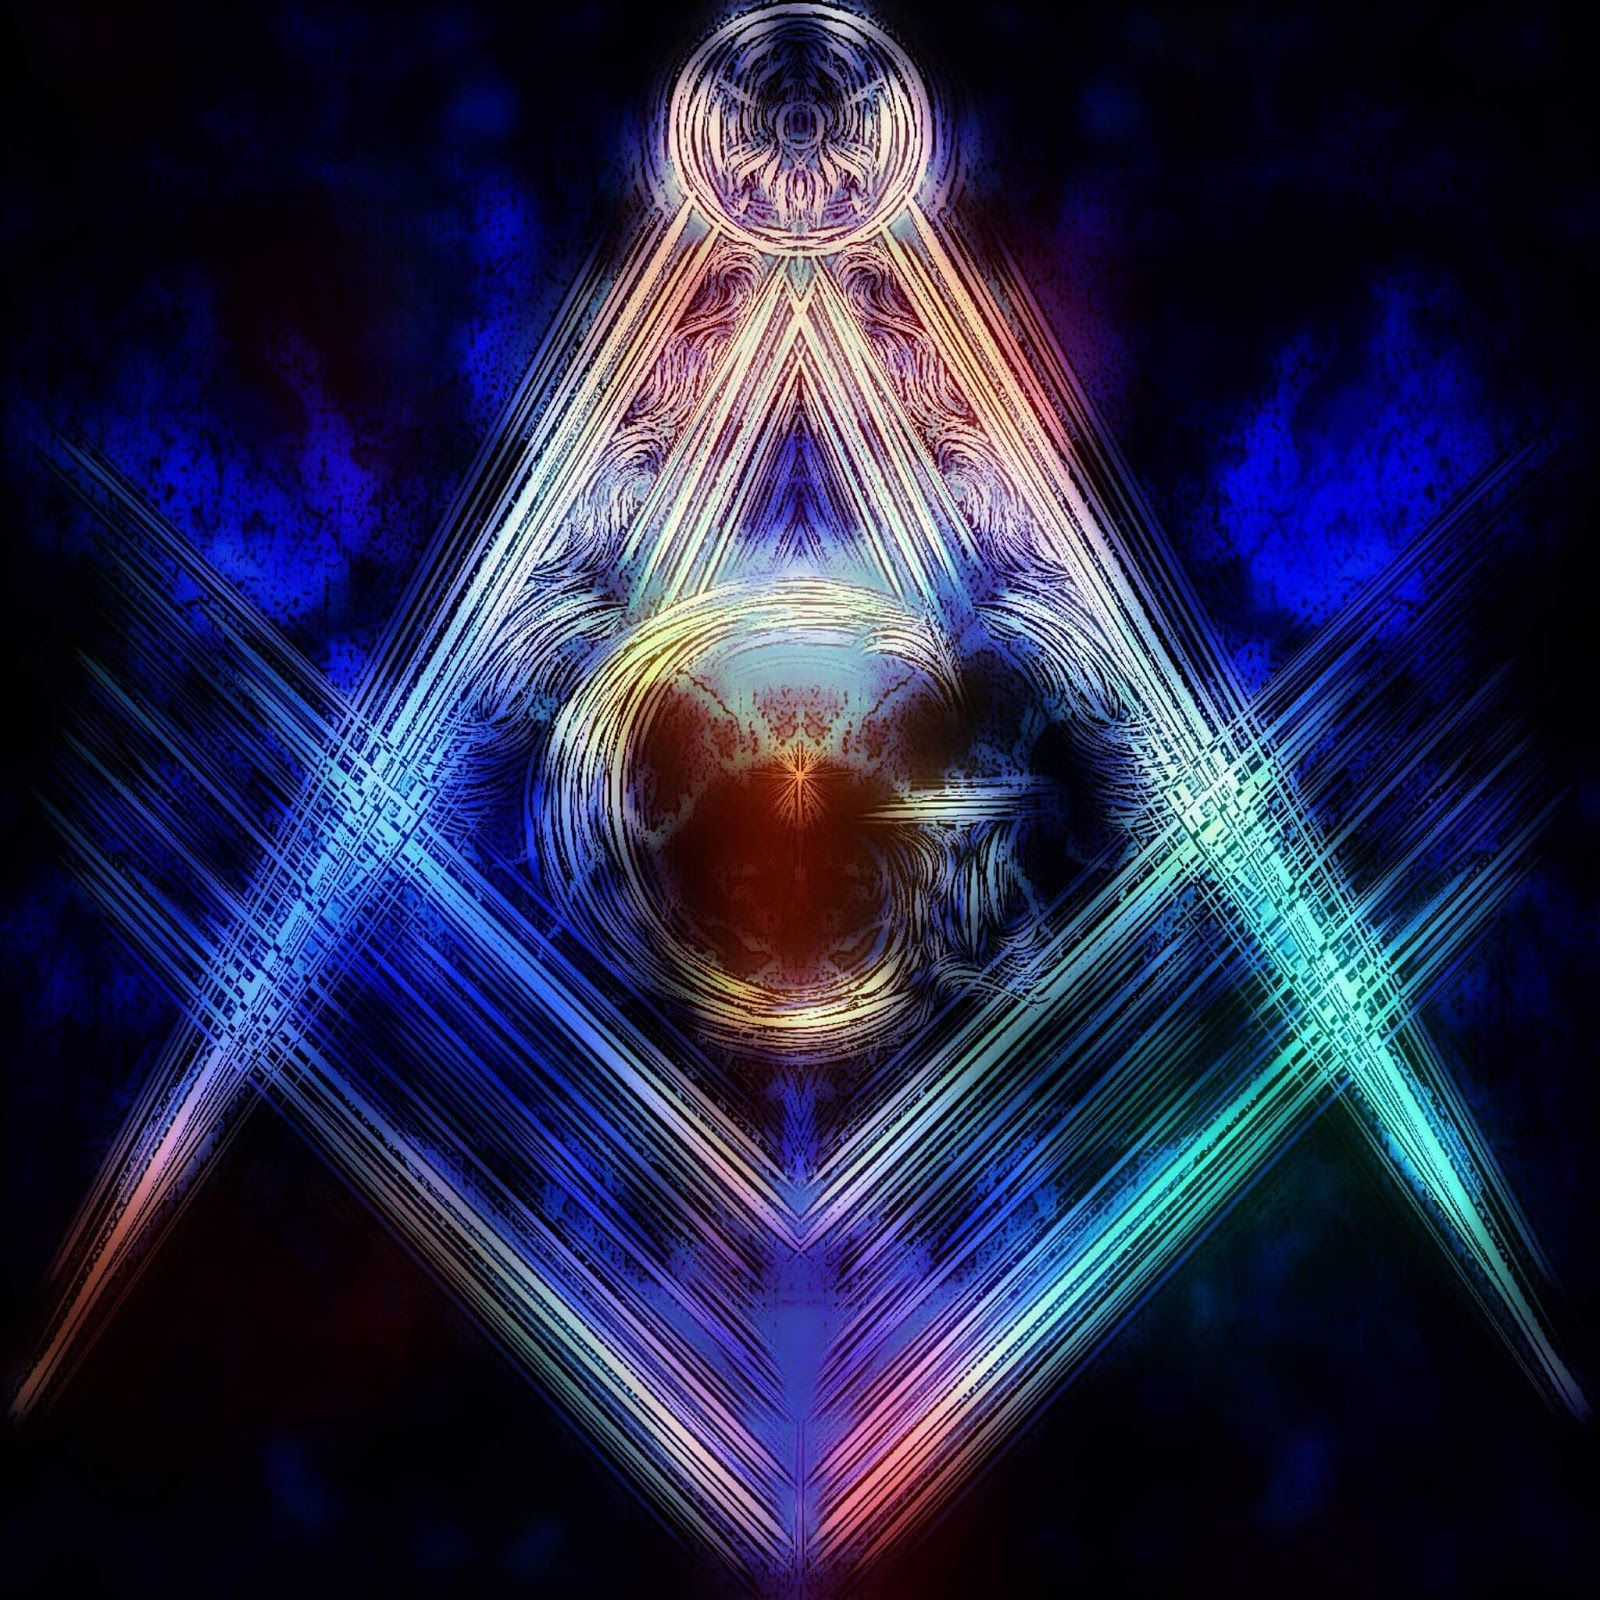 Brother Quotes Wallpaper Hd Pin De Freemasonry Squared Em Freemasonry Squared